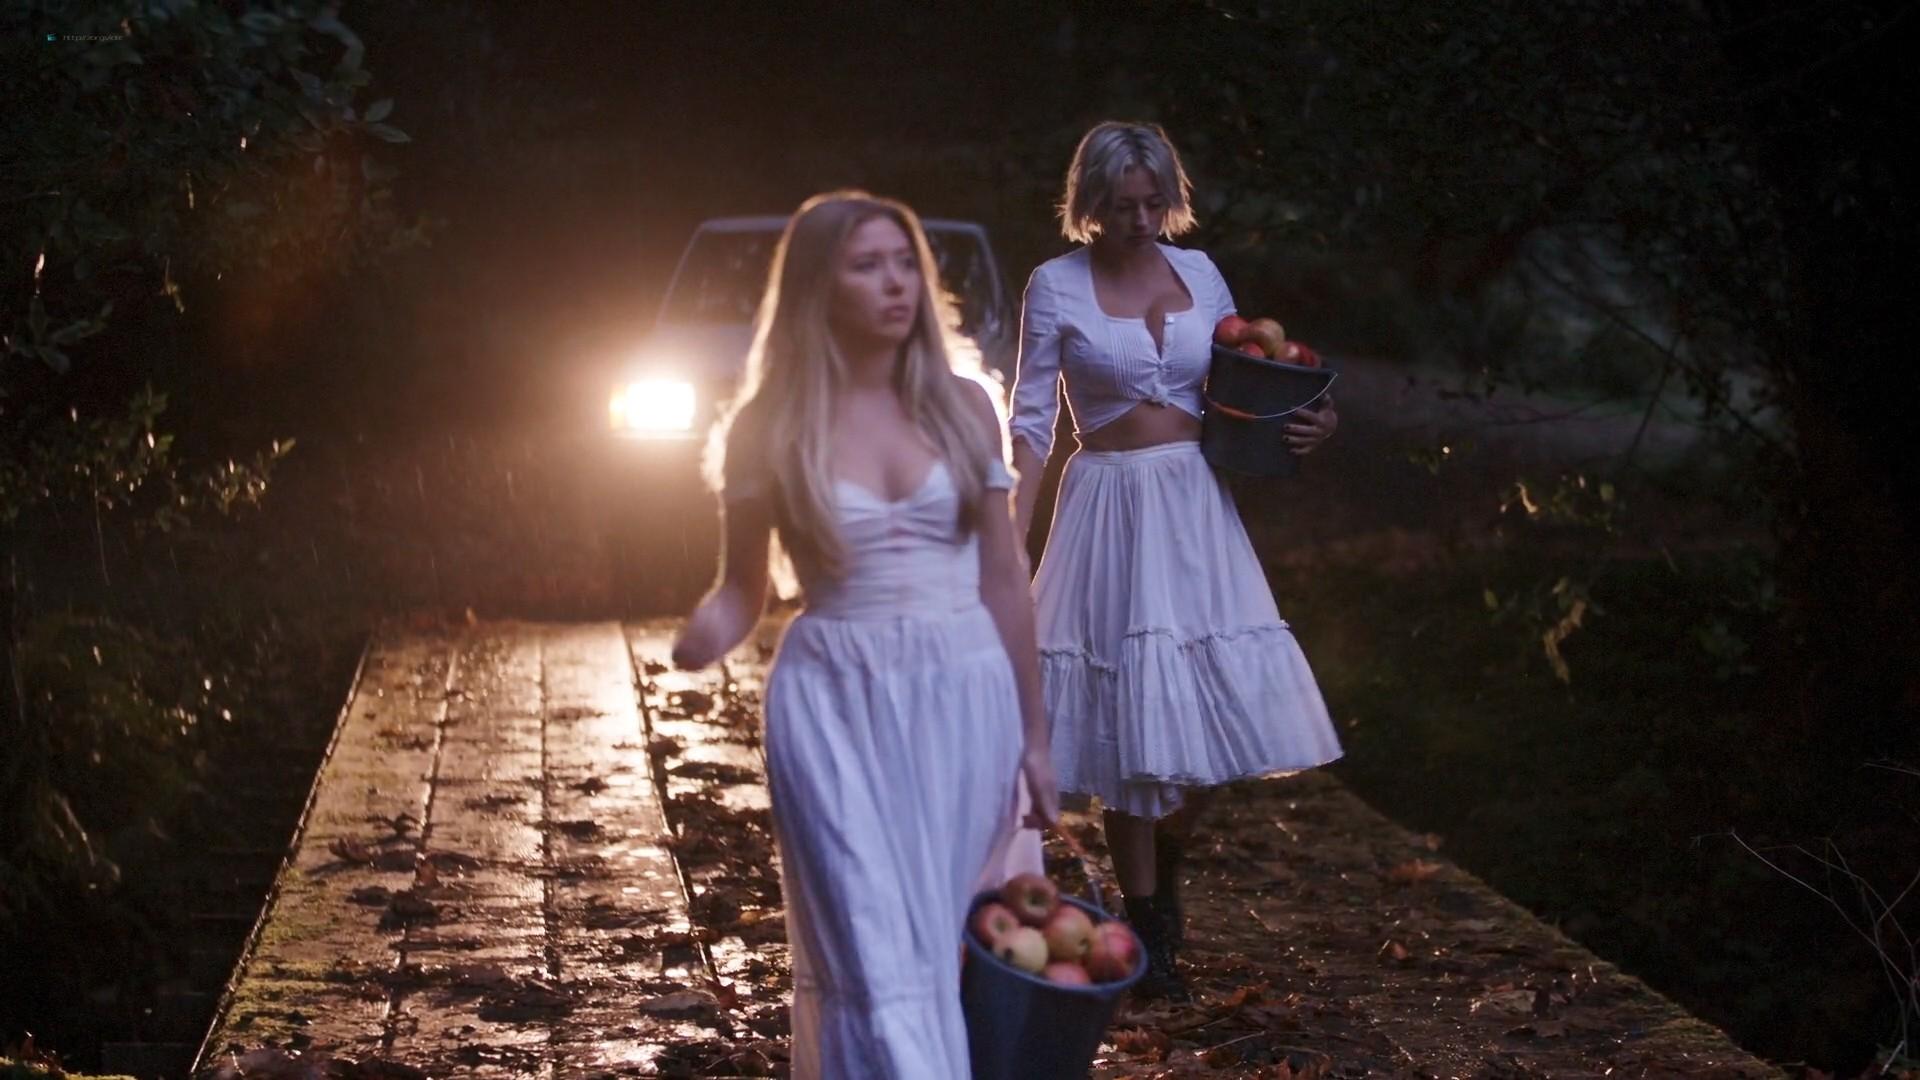 Caroline Vreeland busty see through Zoe Chait, Kenzie Dalton hot - Red Handed (2019) 1080p Web (11)